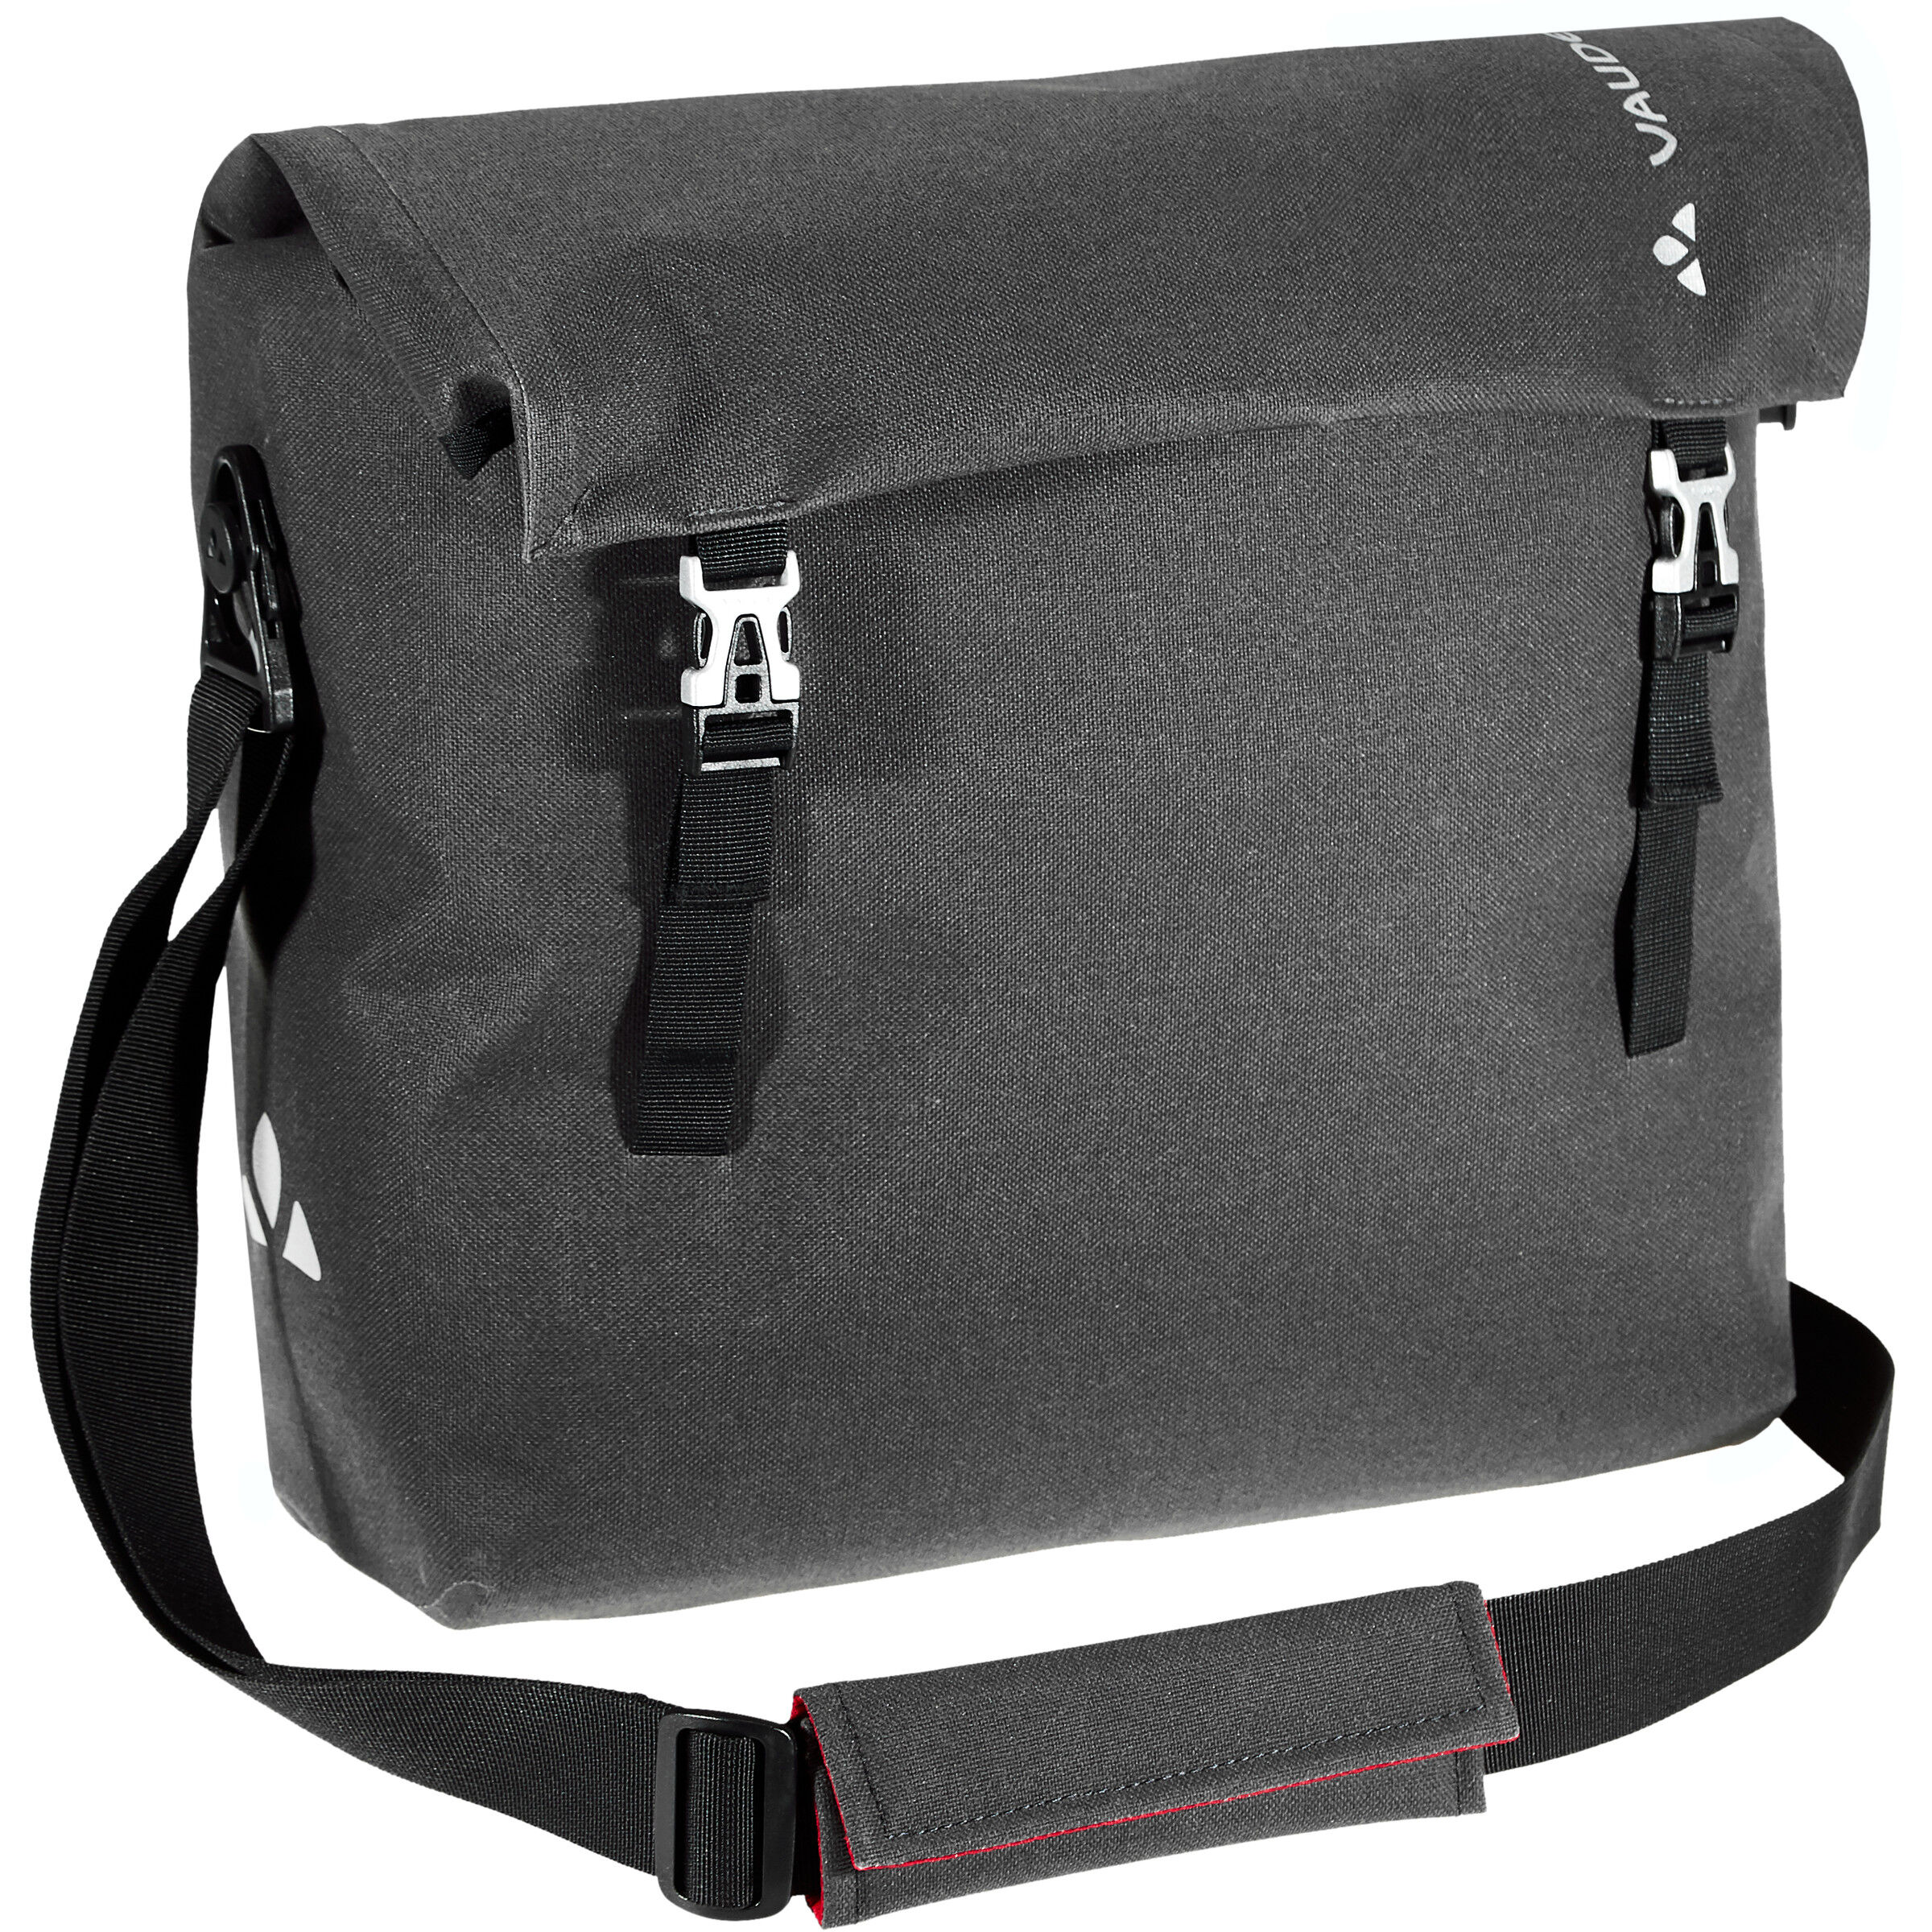 VAUDE Augsburg III Bag S phantom black